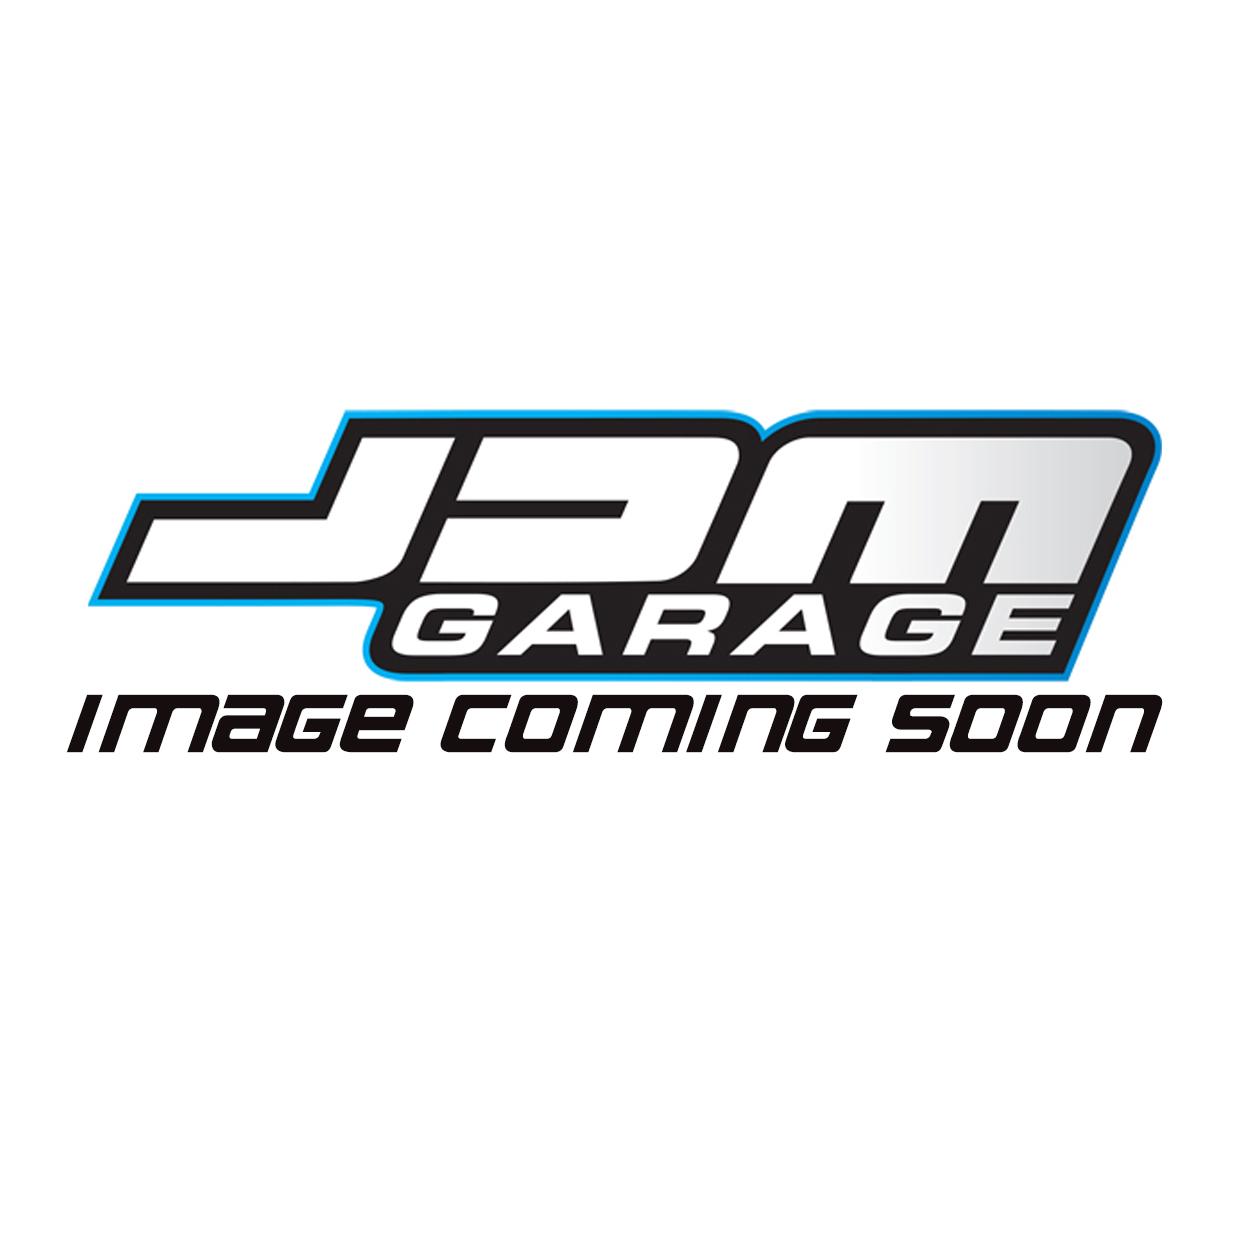 Nardi Gara 4/4 Steering Wheel - Wood - 365mm